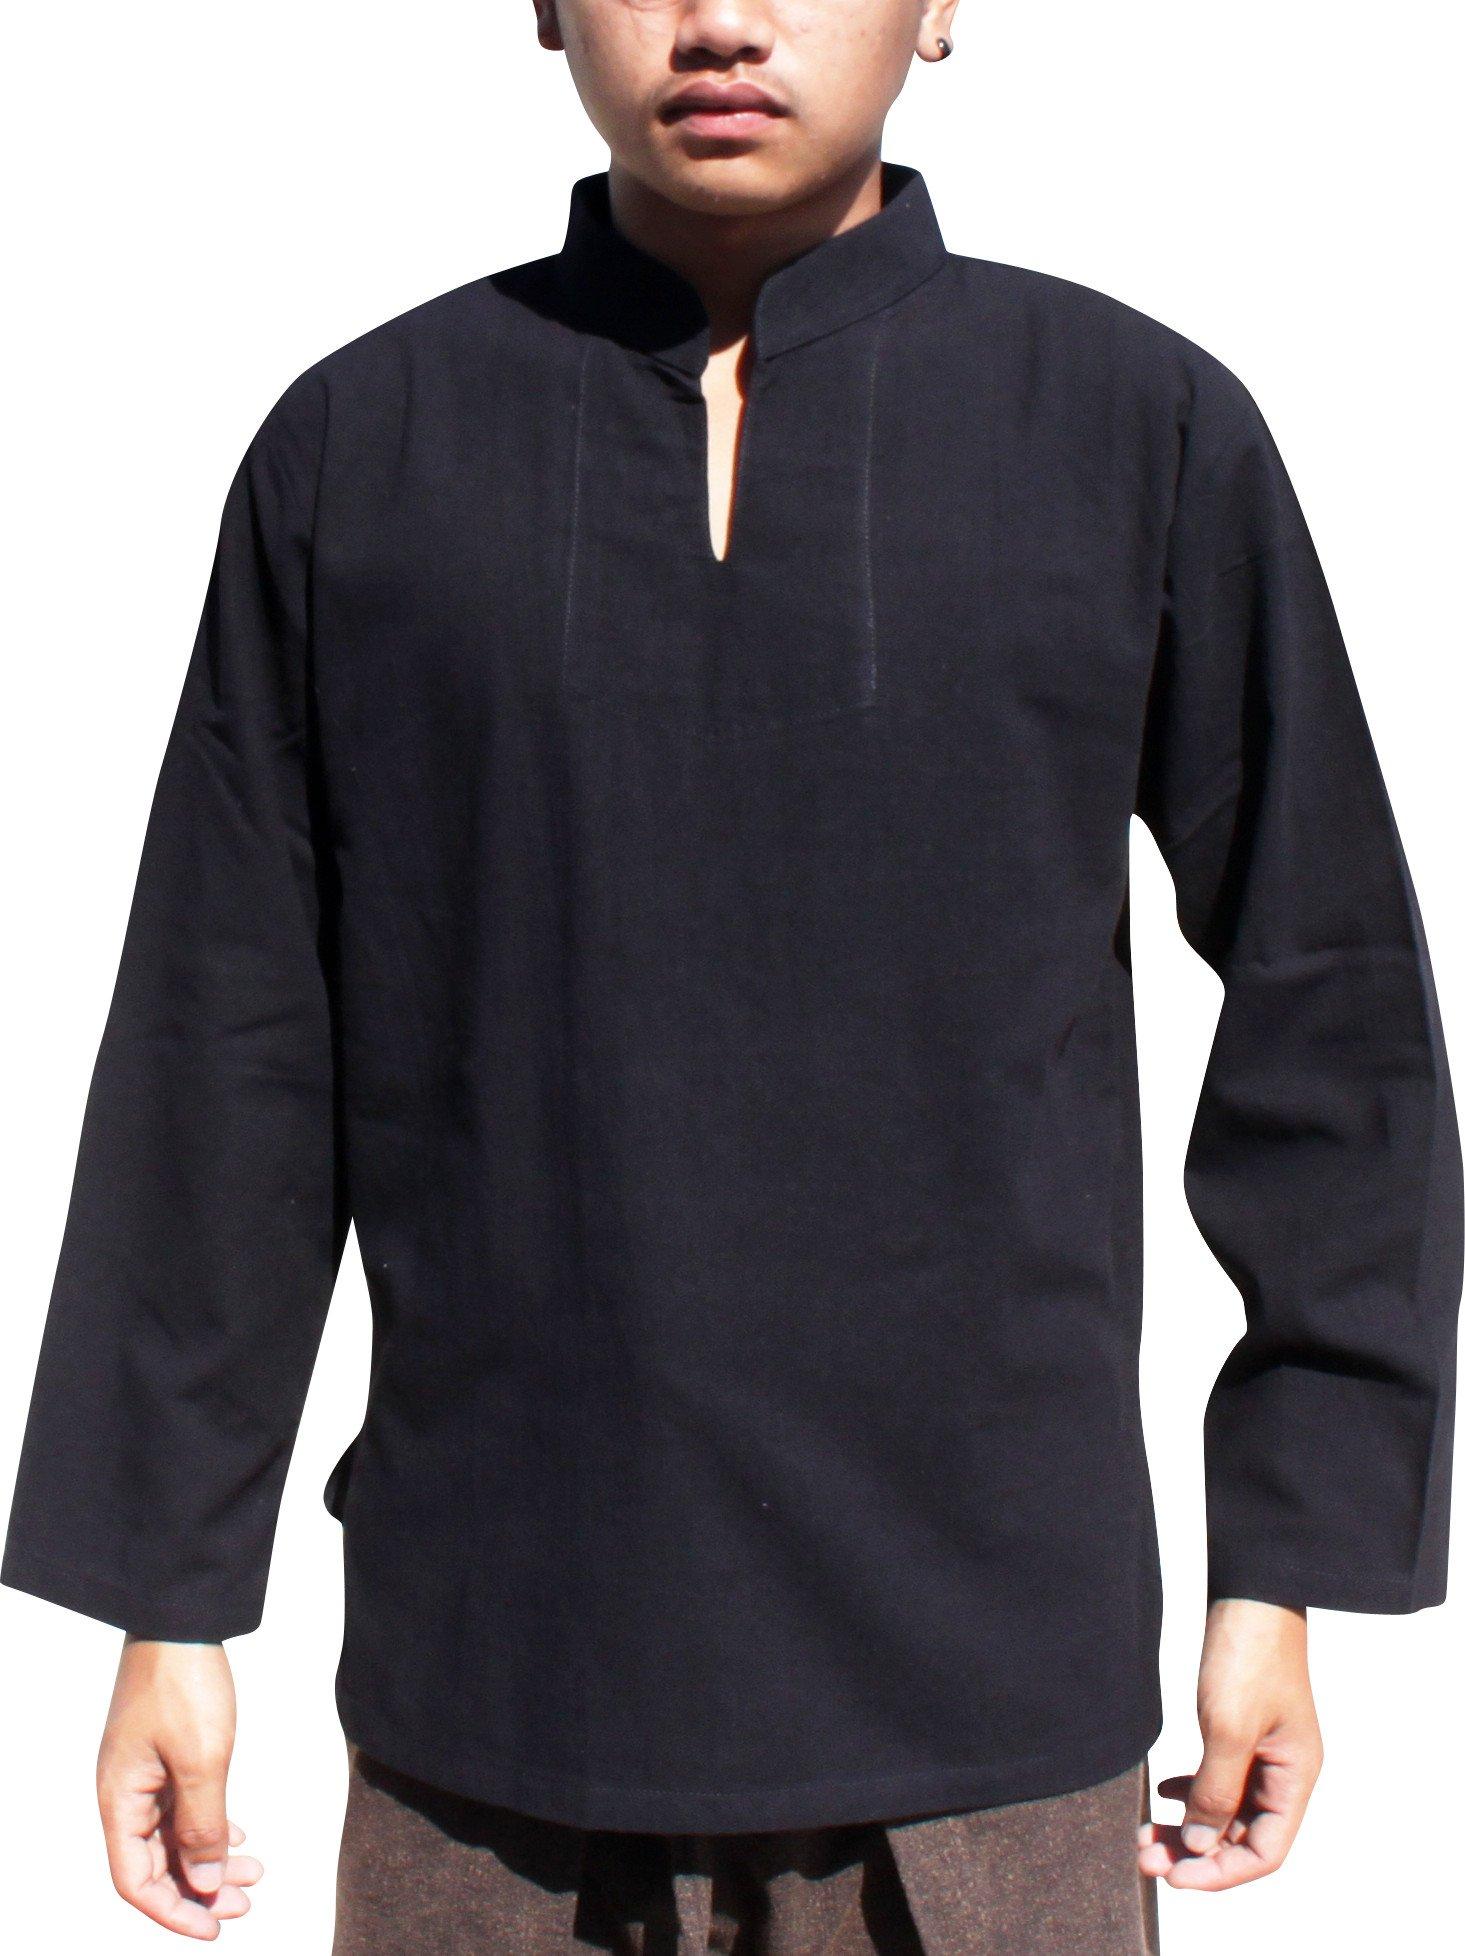 Raan Pah Muang RaanPahMuang Chinese Collar Long Sleeve Shirt YeapHai NonStandard Weave Cotton, Medium, Black